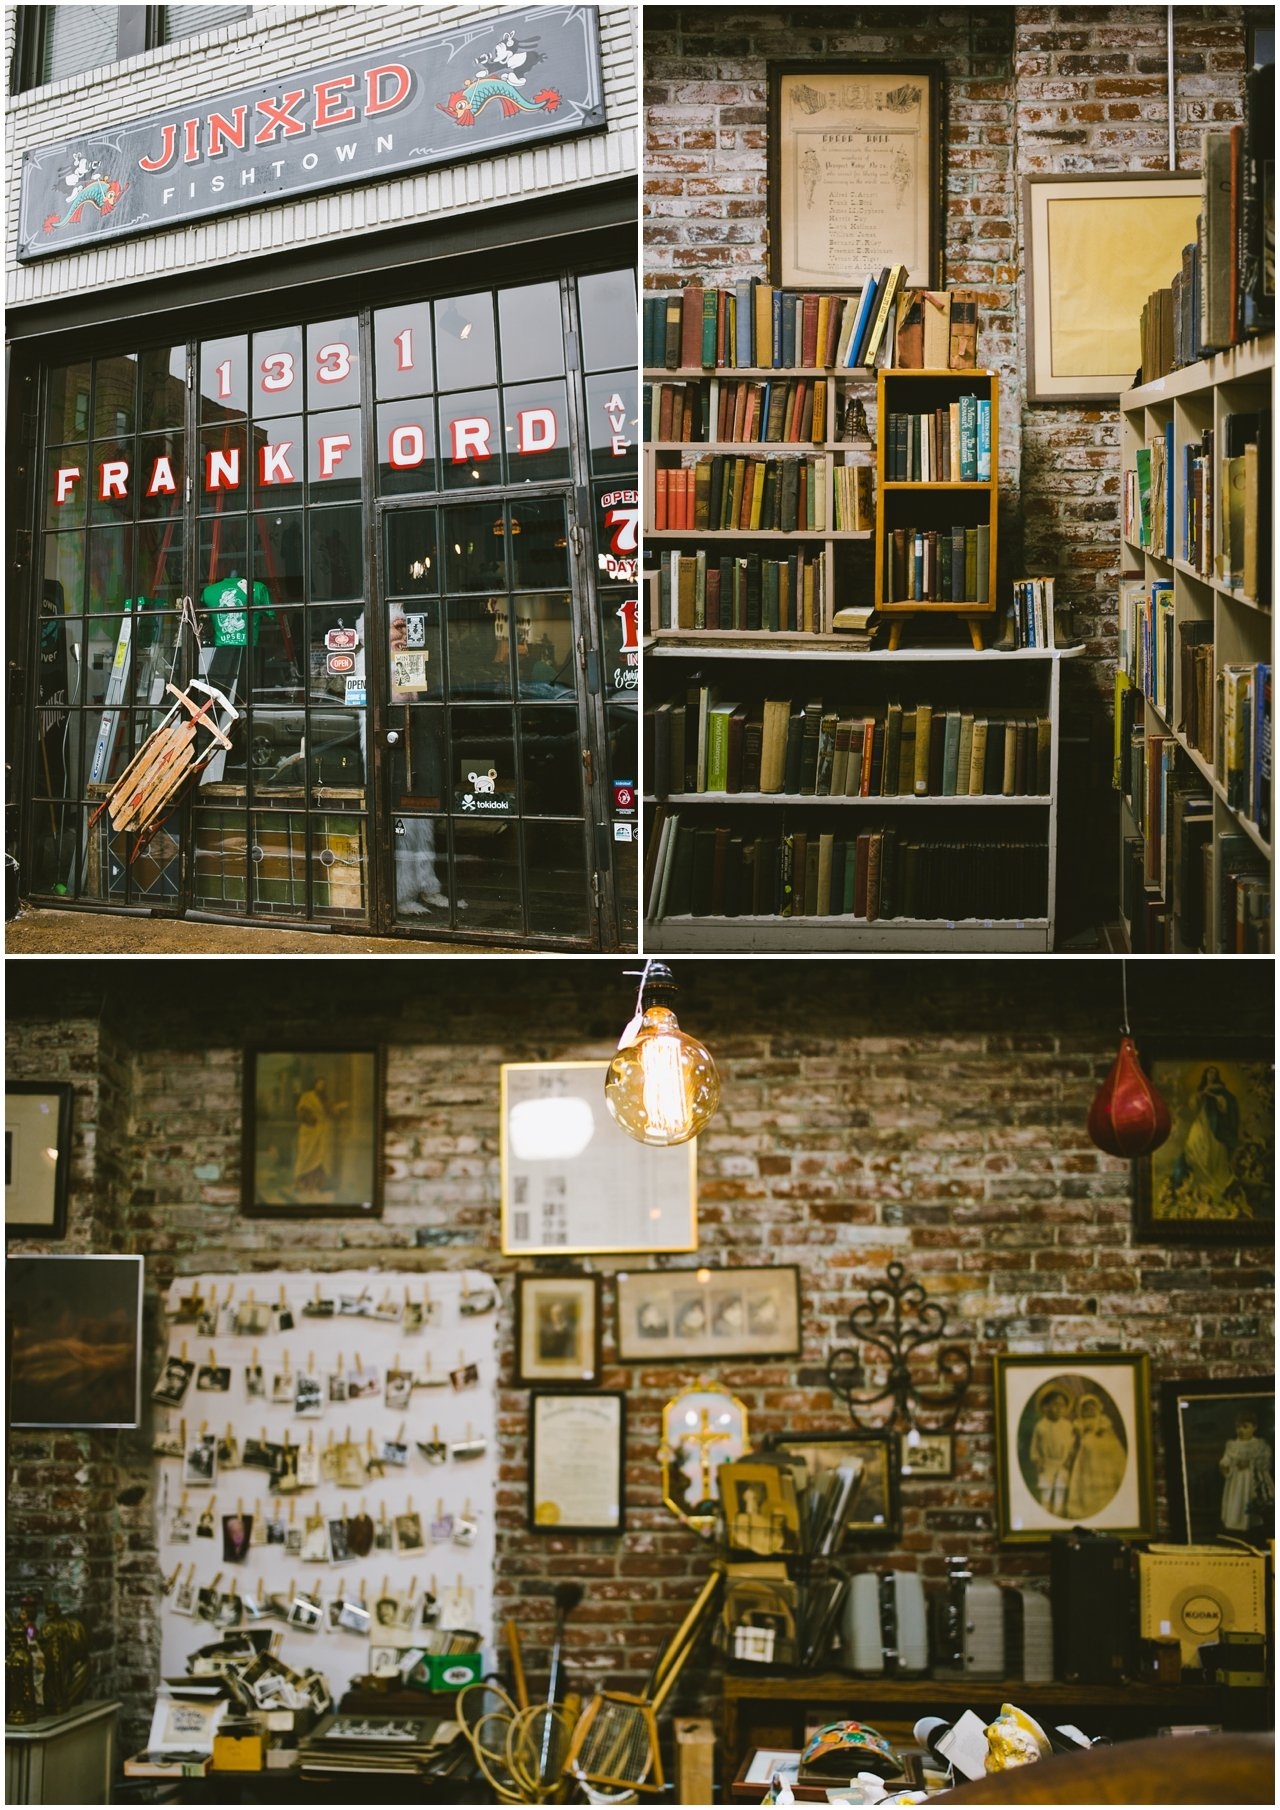 Jinxed Vintage Store in Fishtown, Philadelphia